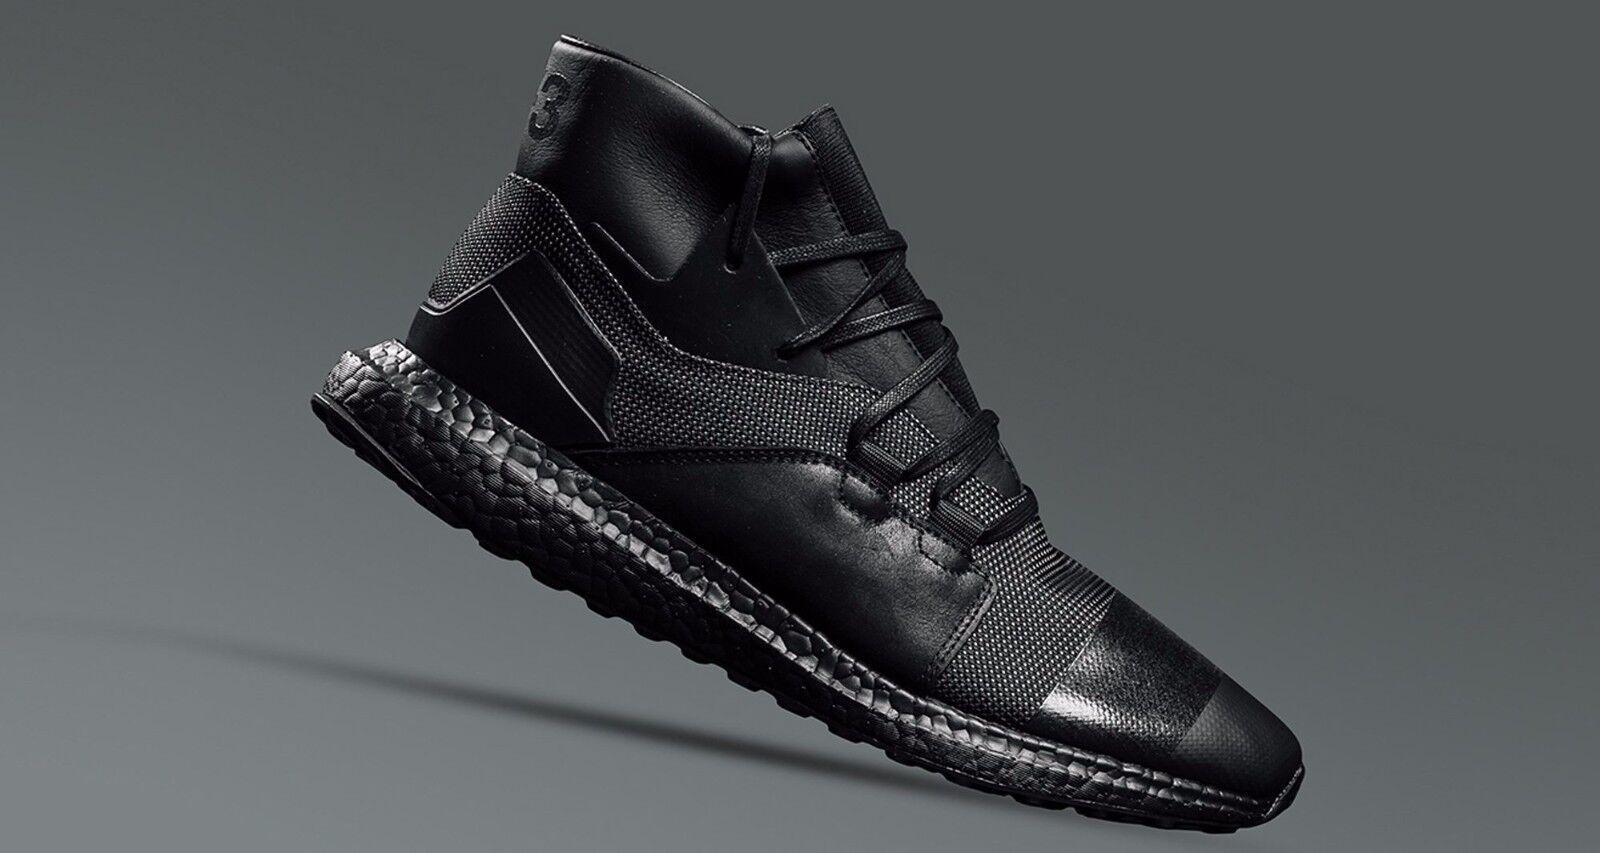 Adidas Y-3 Kozoko High 12.5. Triple Black. Yohji Yamamoto. ultra boost. CG3160.